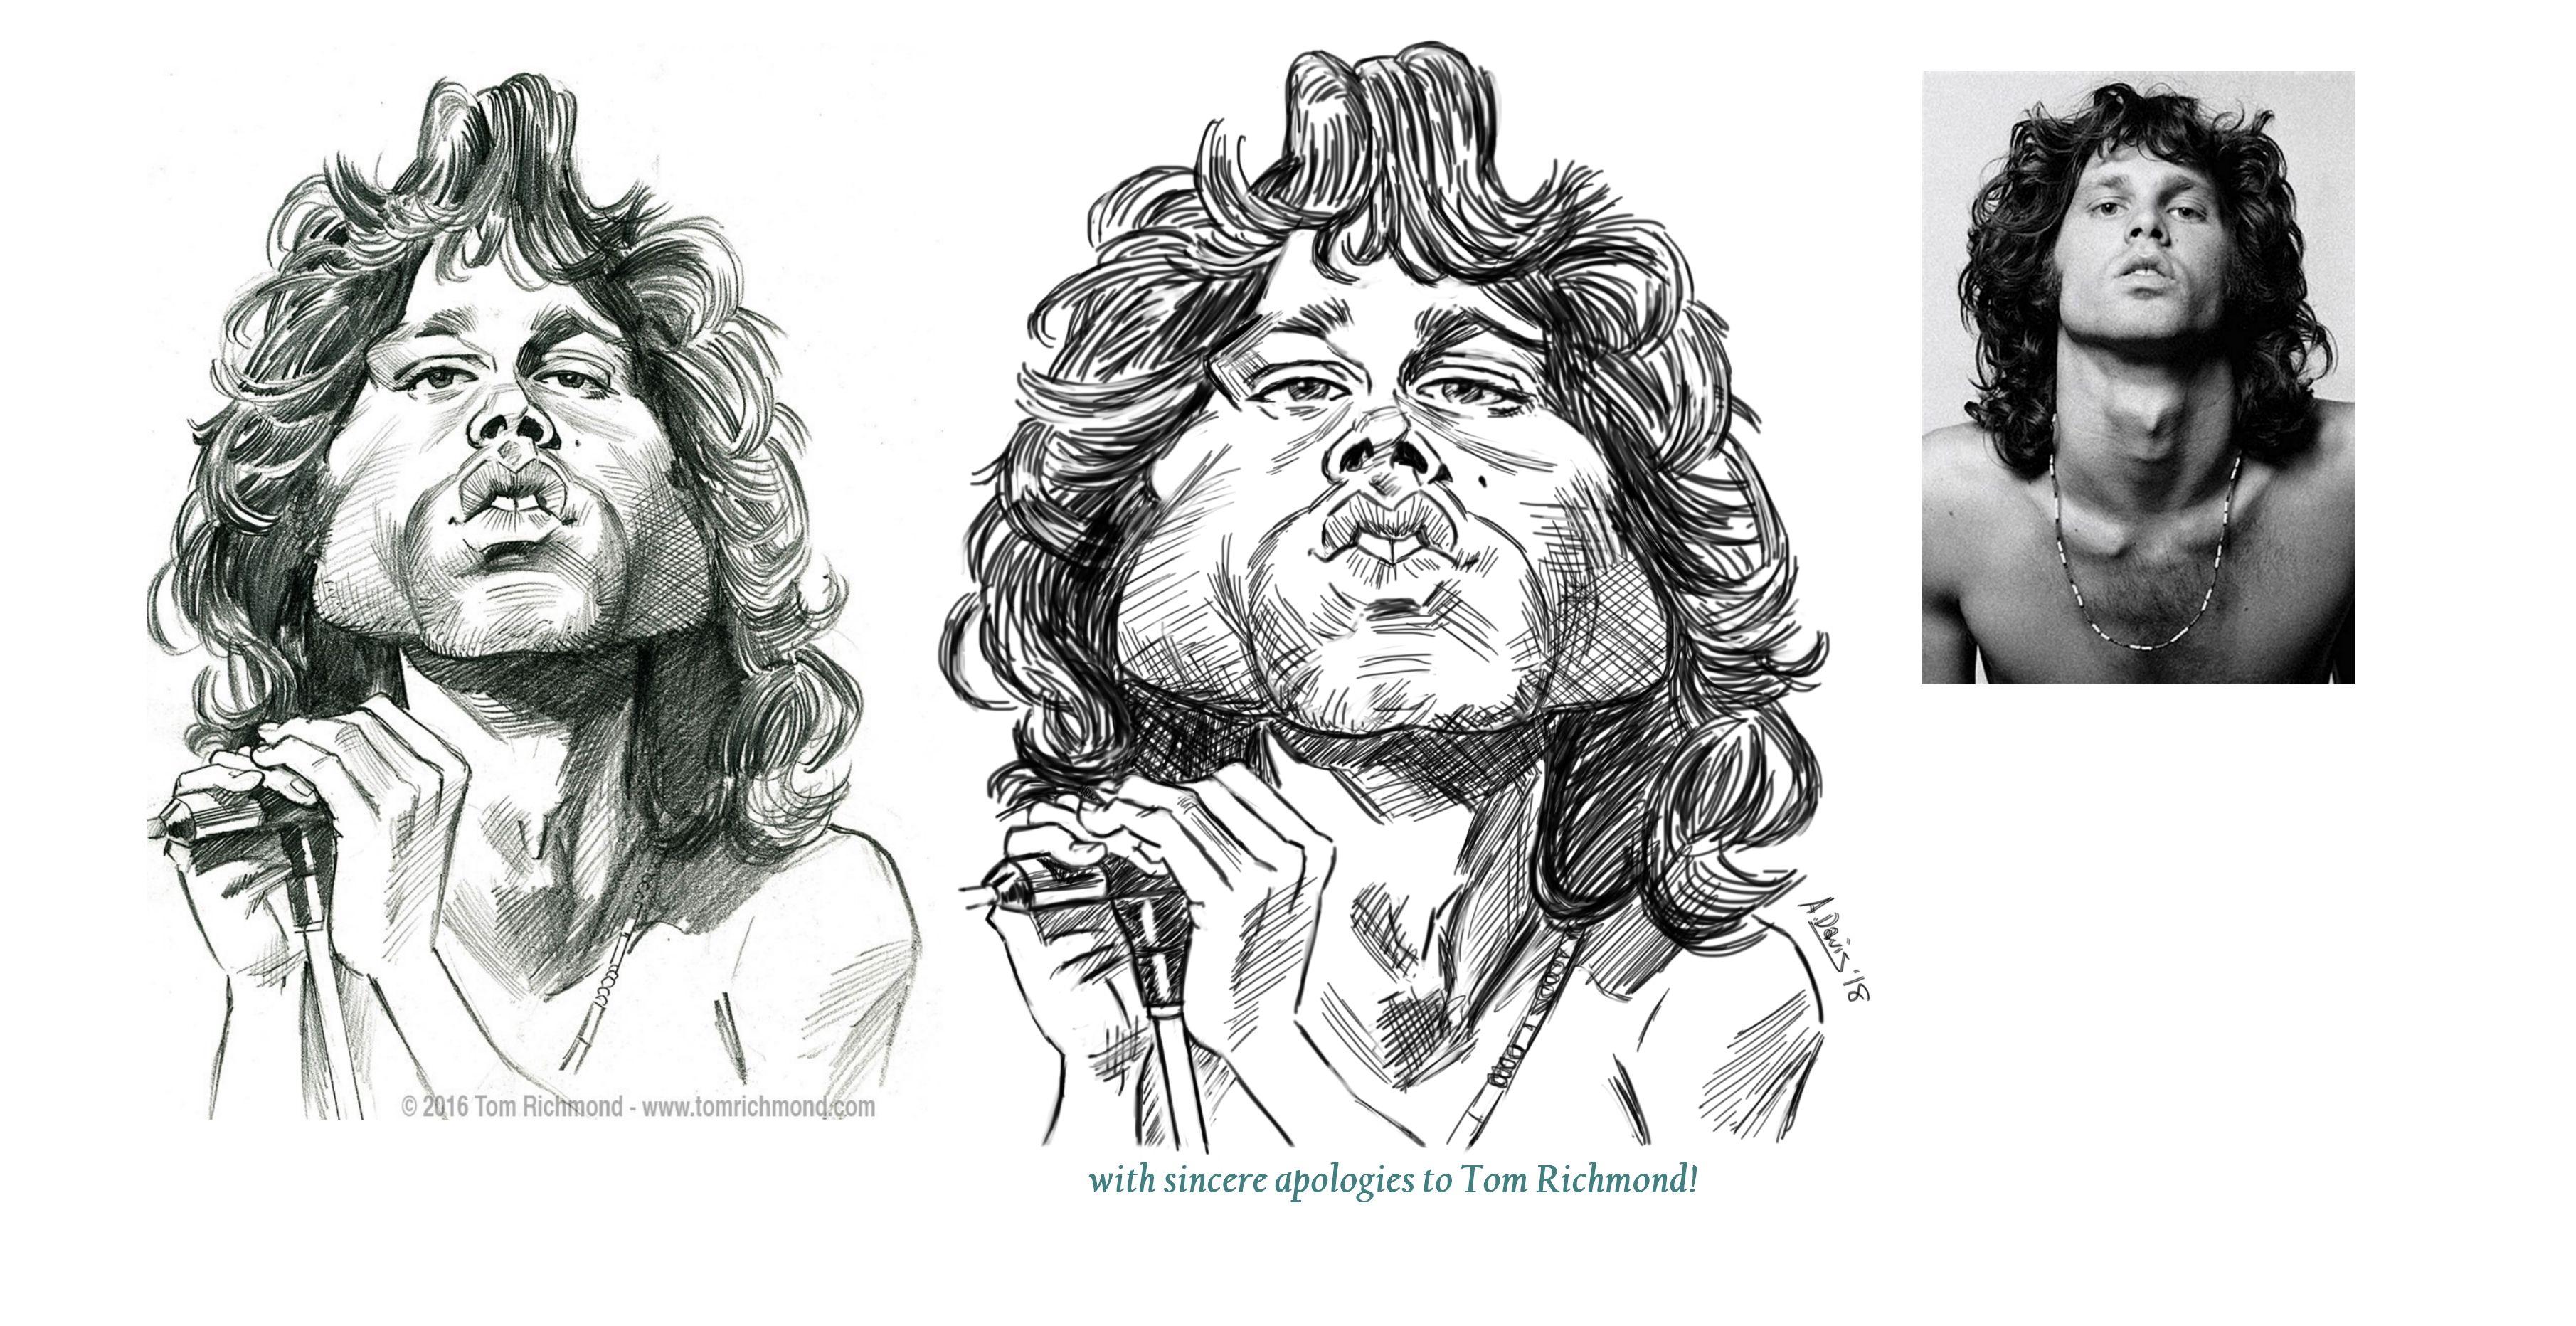 My study of Richmond's Jim Morrison caricature